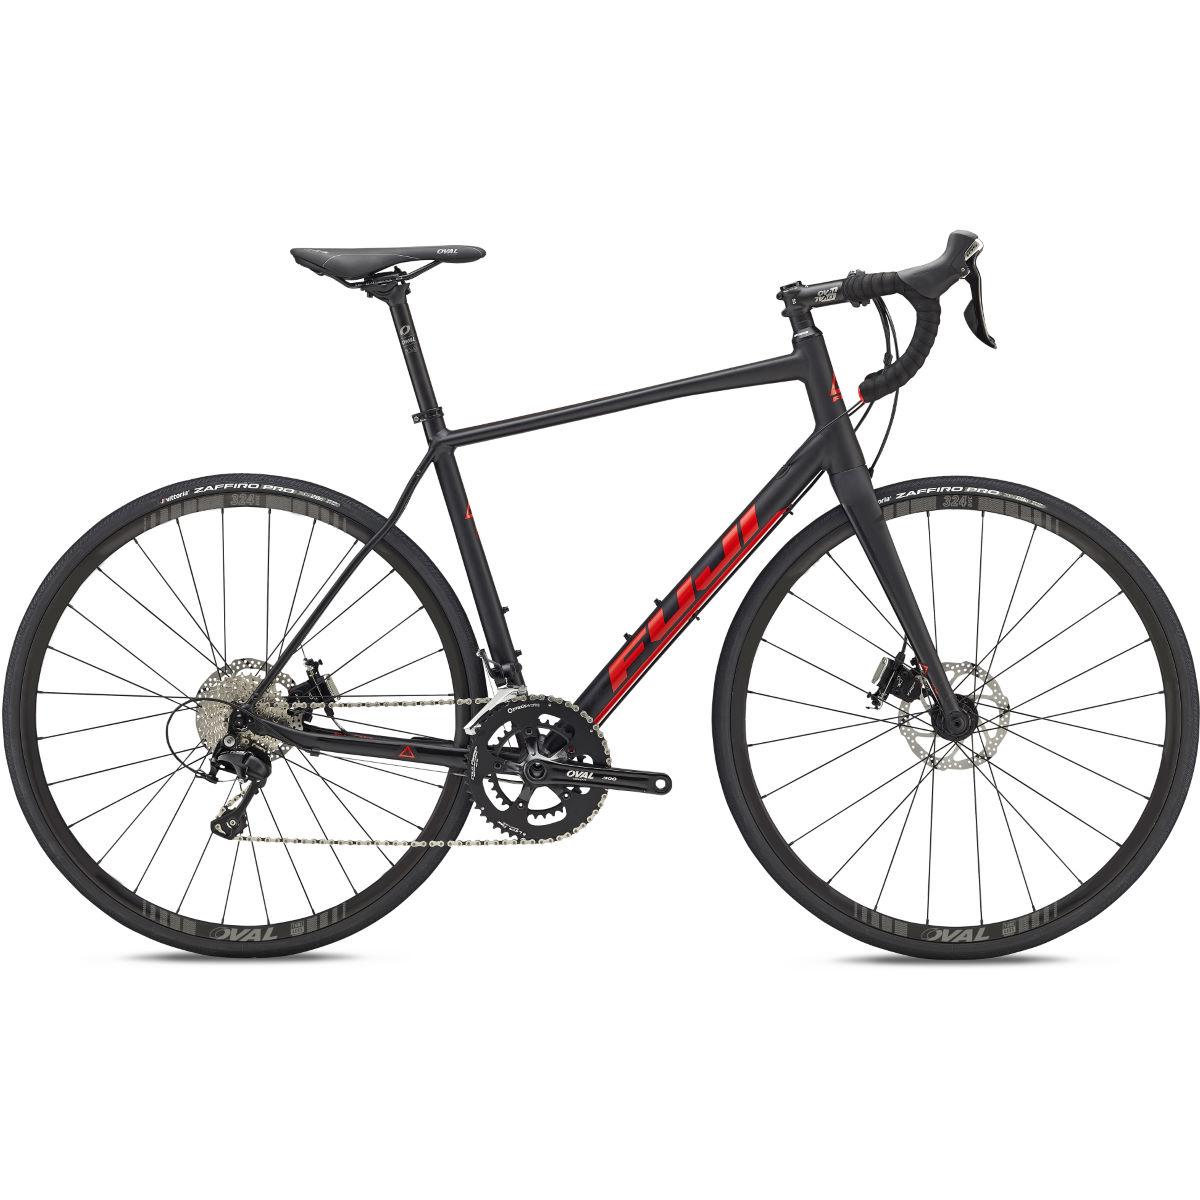 Fuji Sportif 1.3 Disc 2018 Bikes